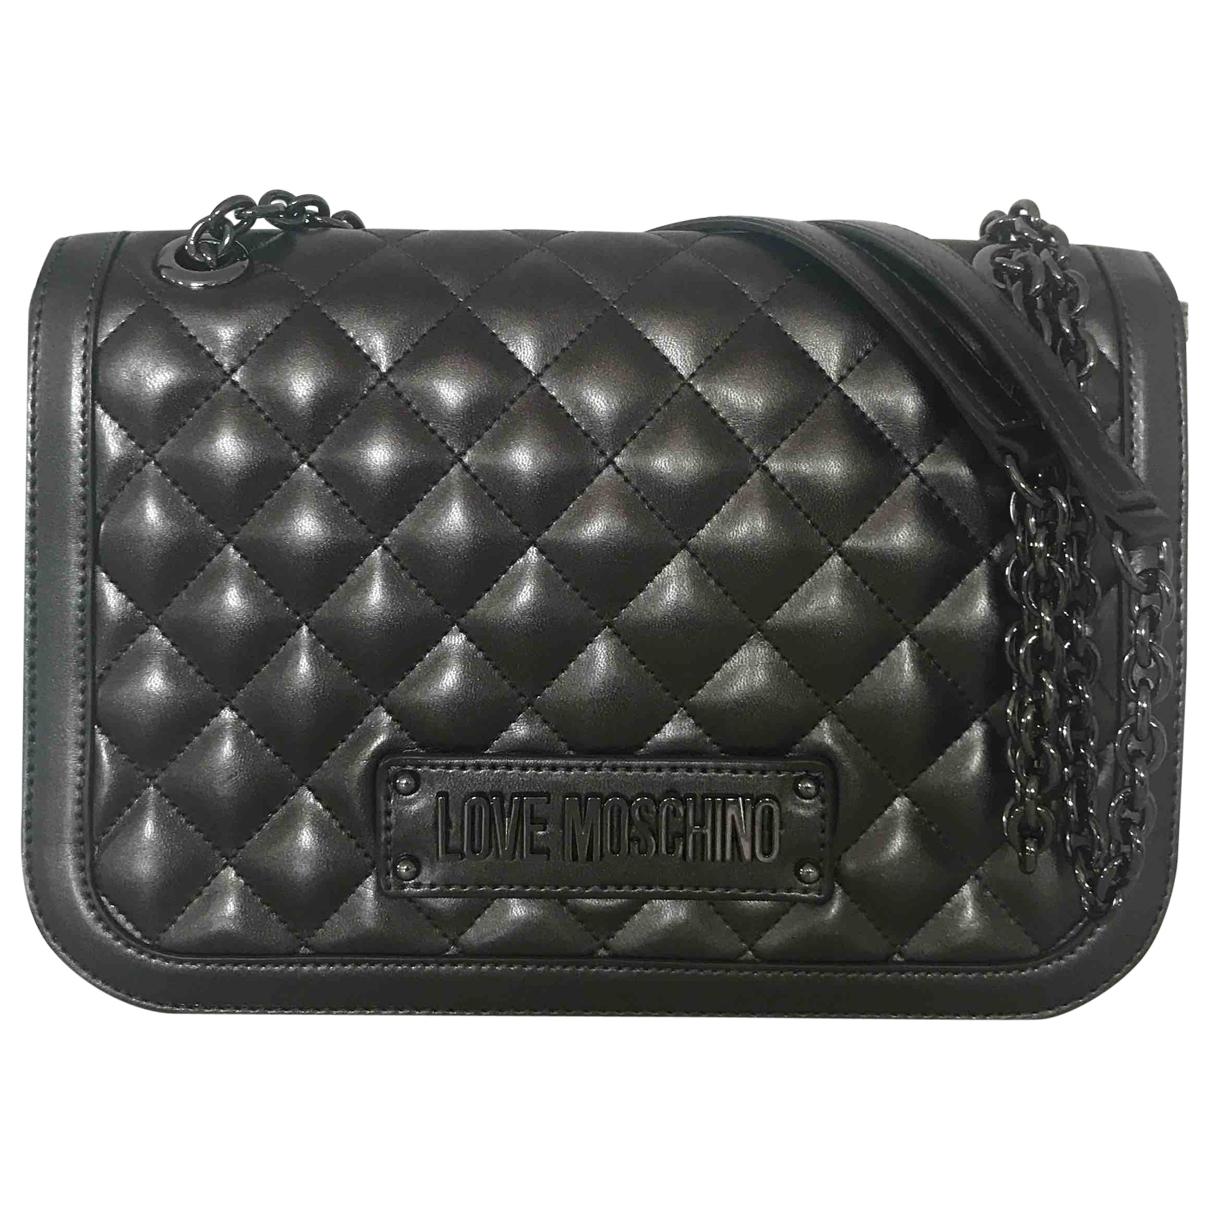 Moschino \N Grey handbag for Women \N